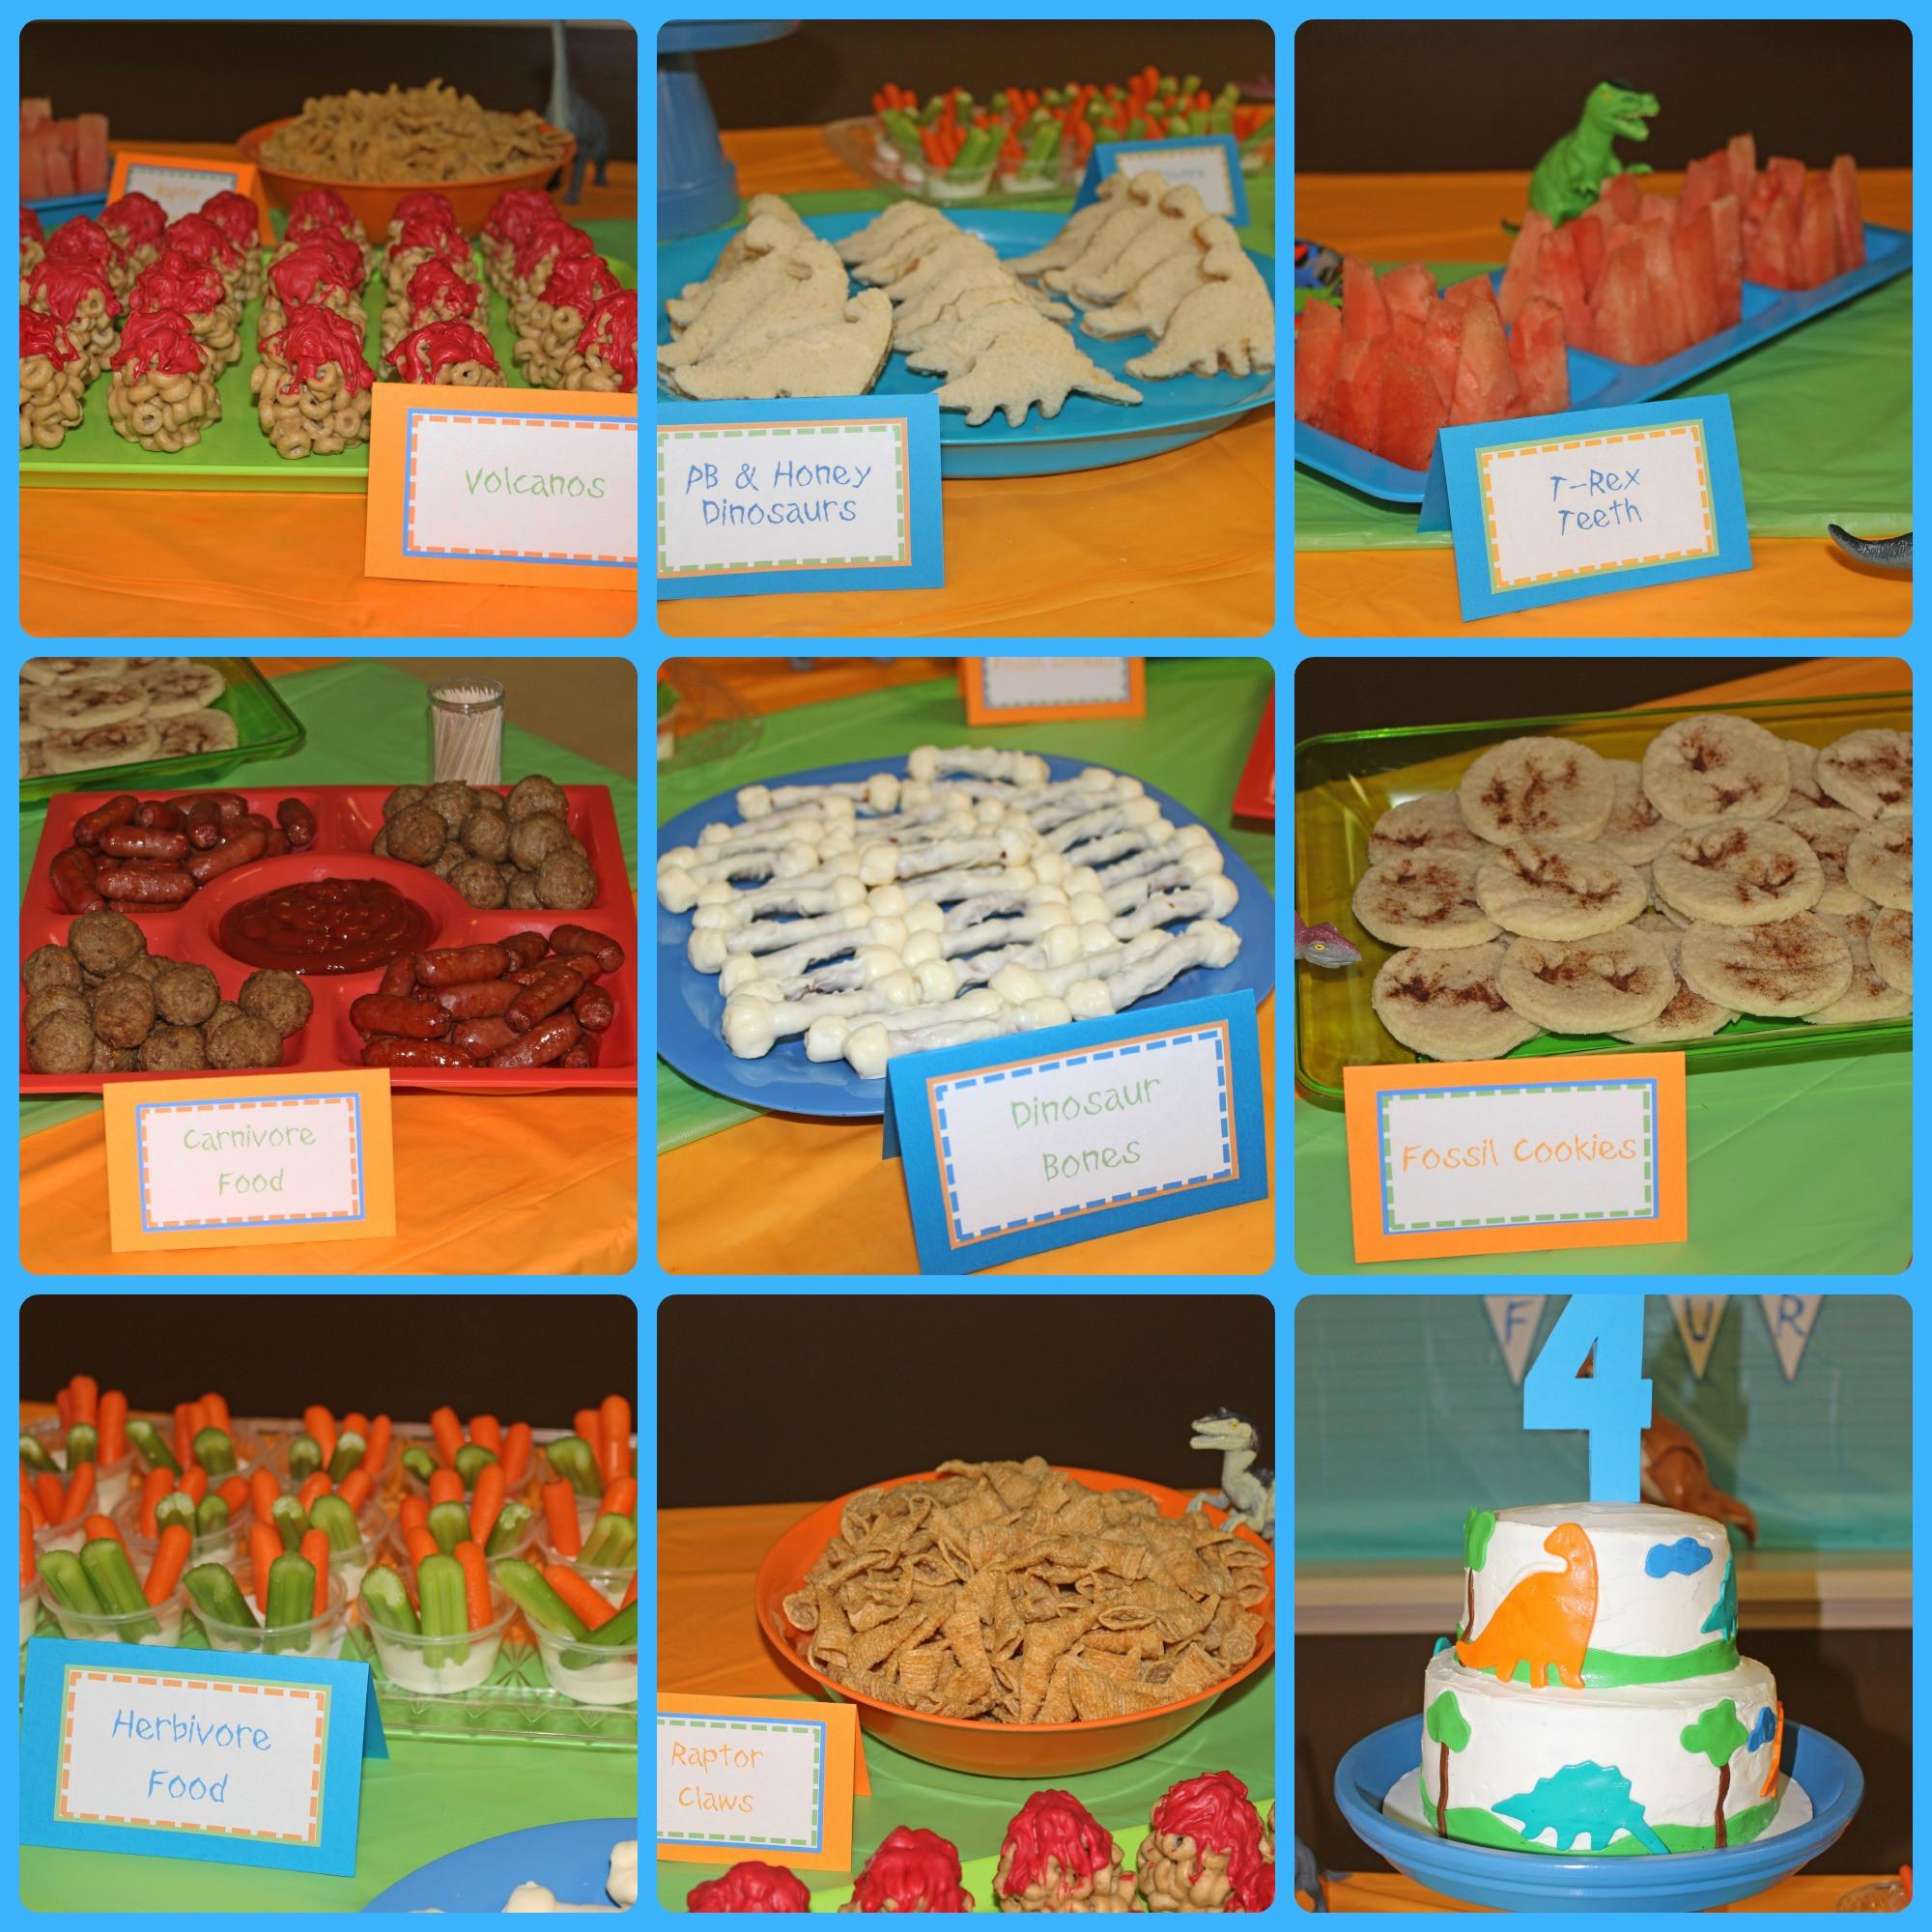 Dinosaur Food Ideas For Birthday Party  dinosaur party food